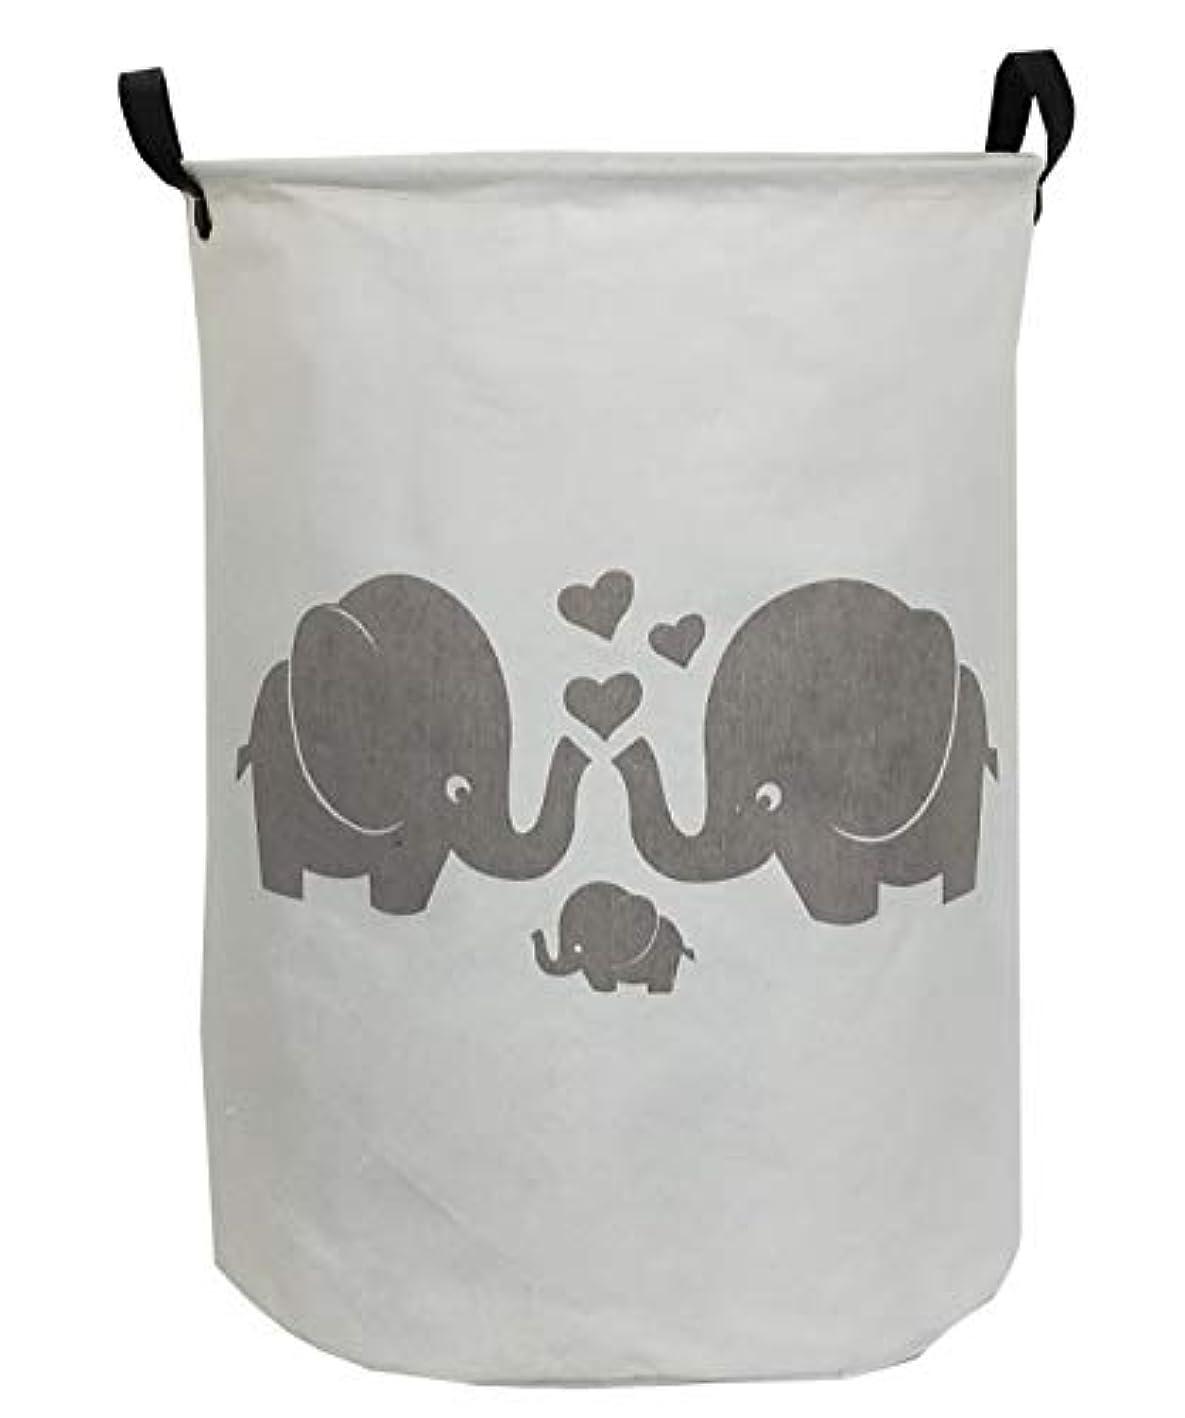 ESSME Laundry Hamper,Collapsible Canvas Waterproof Storage Bin for Kids, Nursery Hamper,Gift Baskets,Home Organizer (Love Elephant)